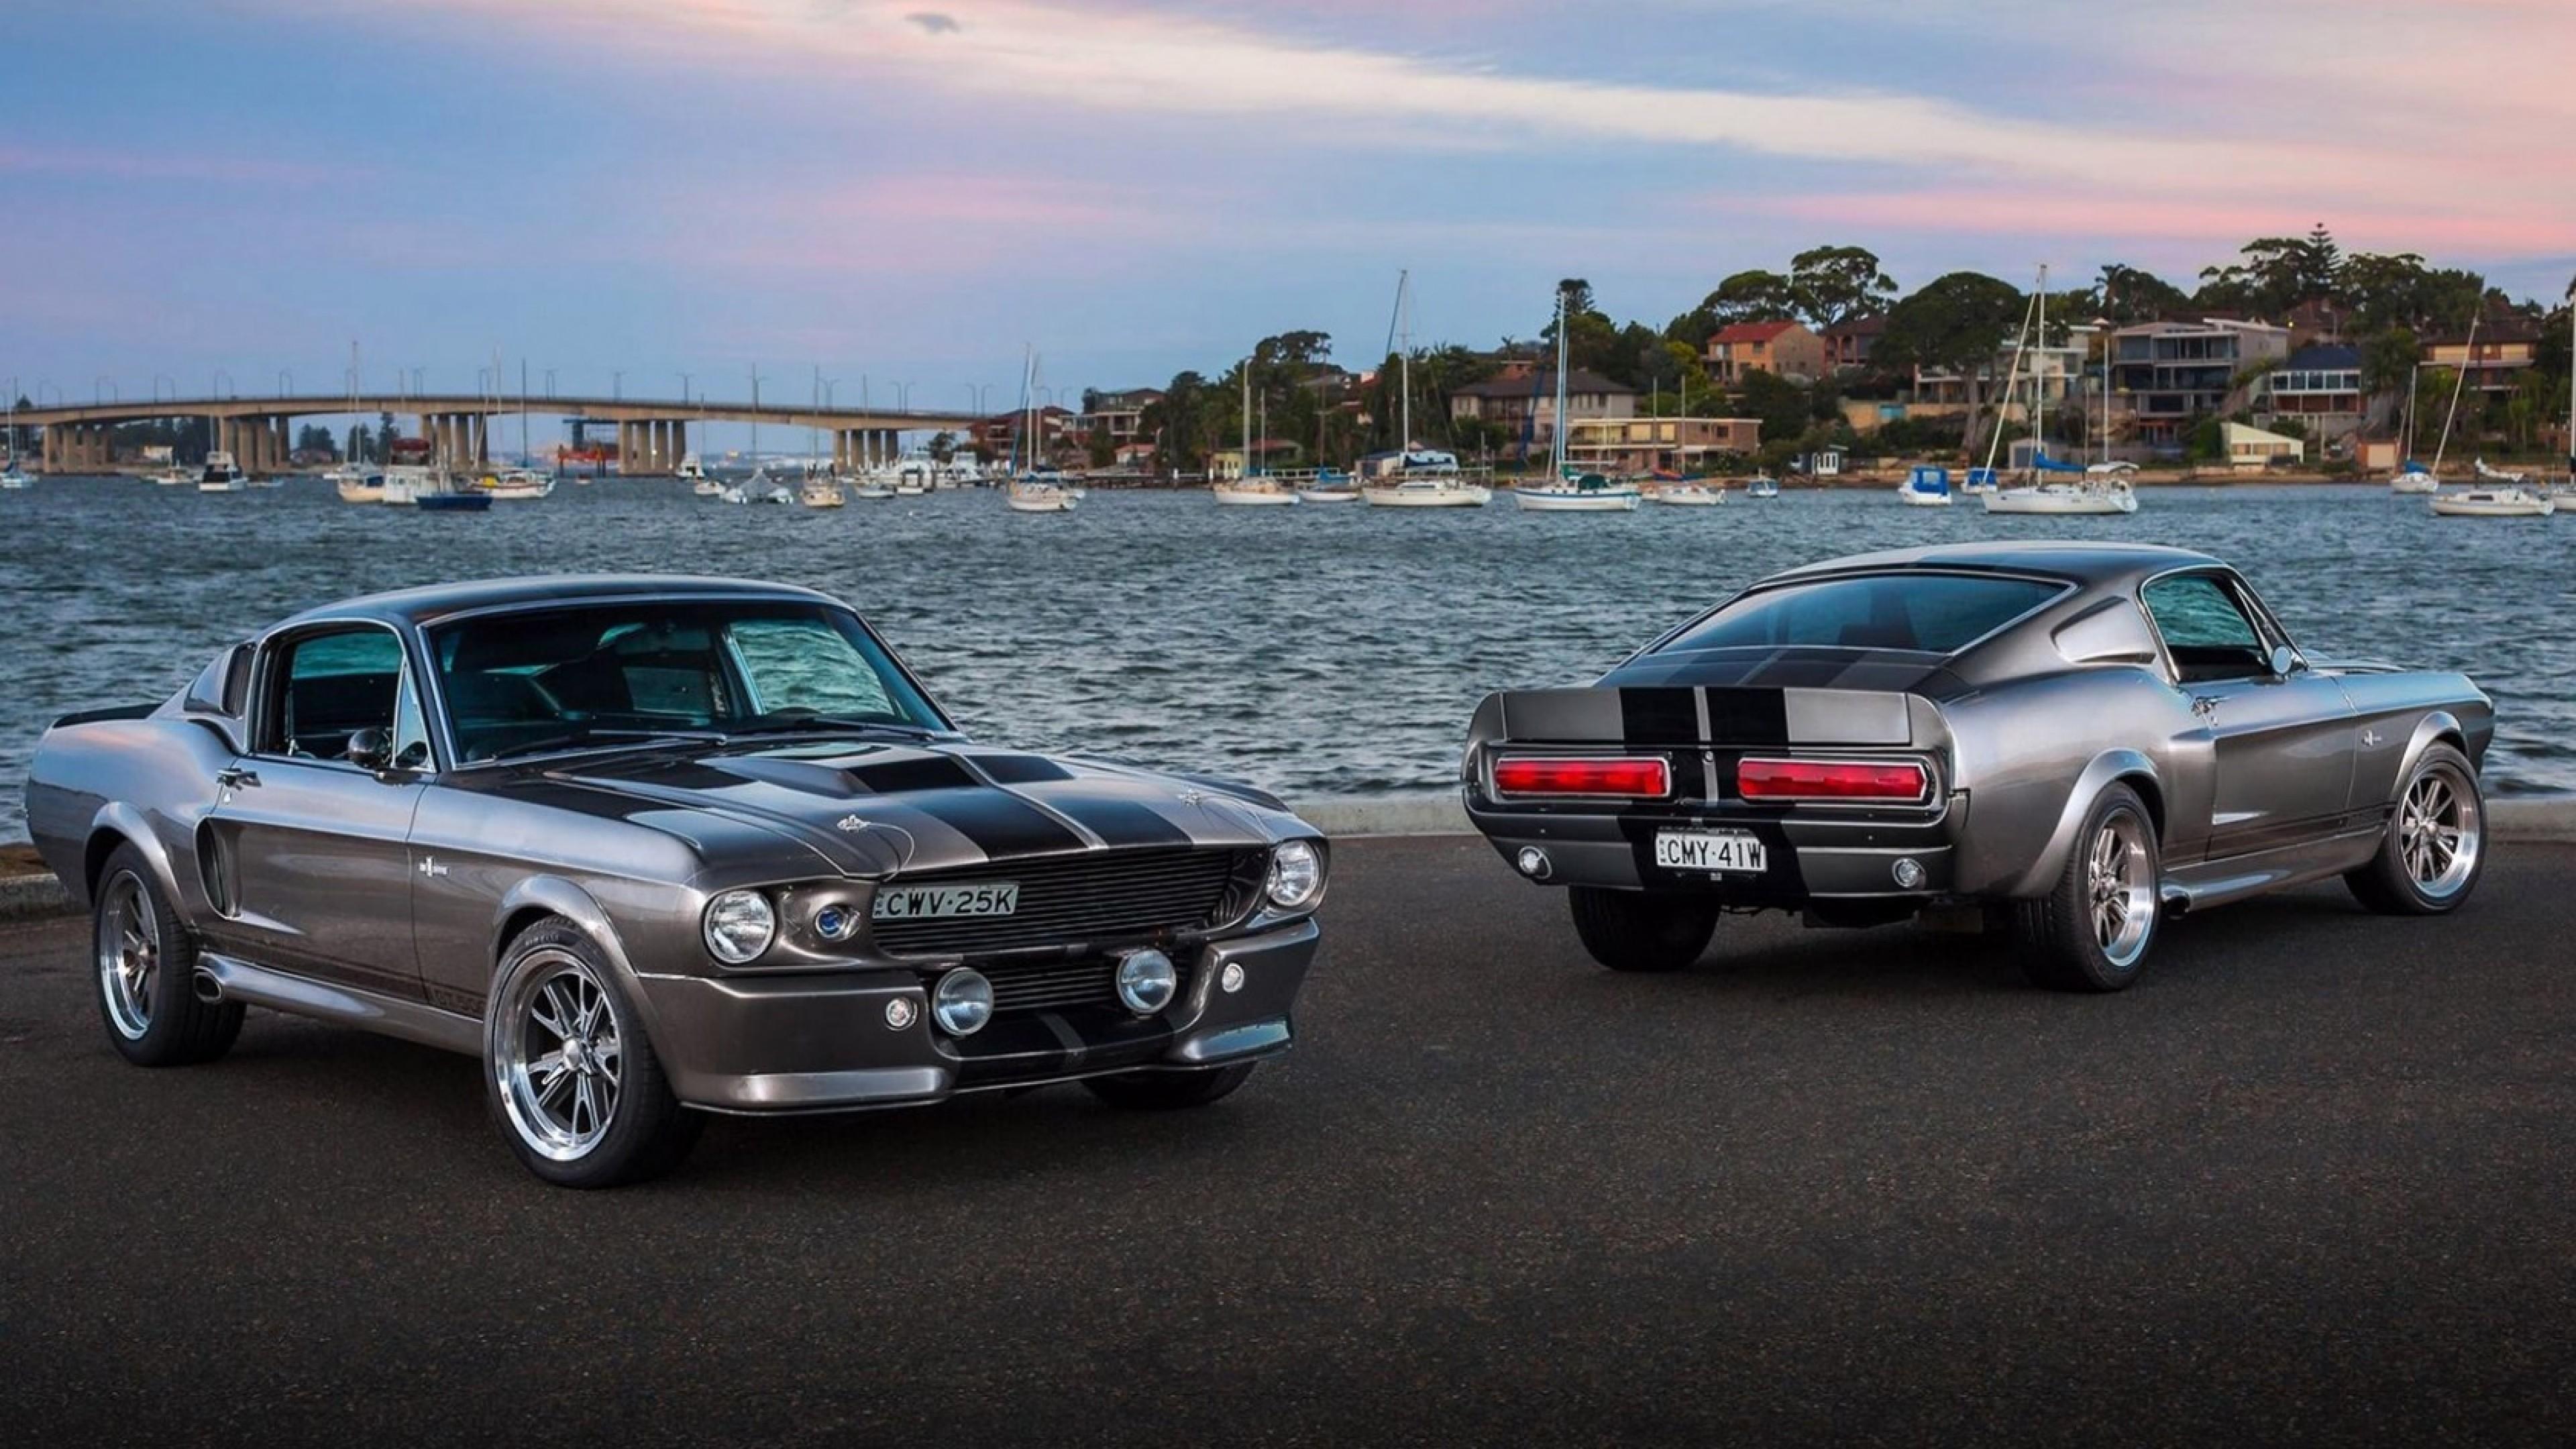 Ford Mustang Wallpaper 4K